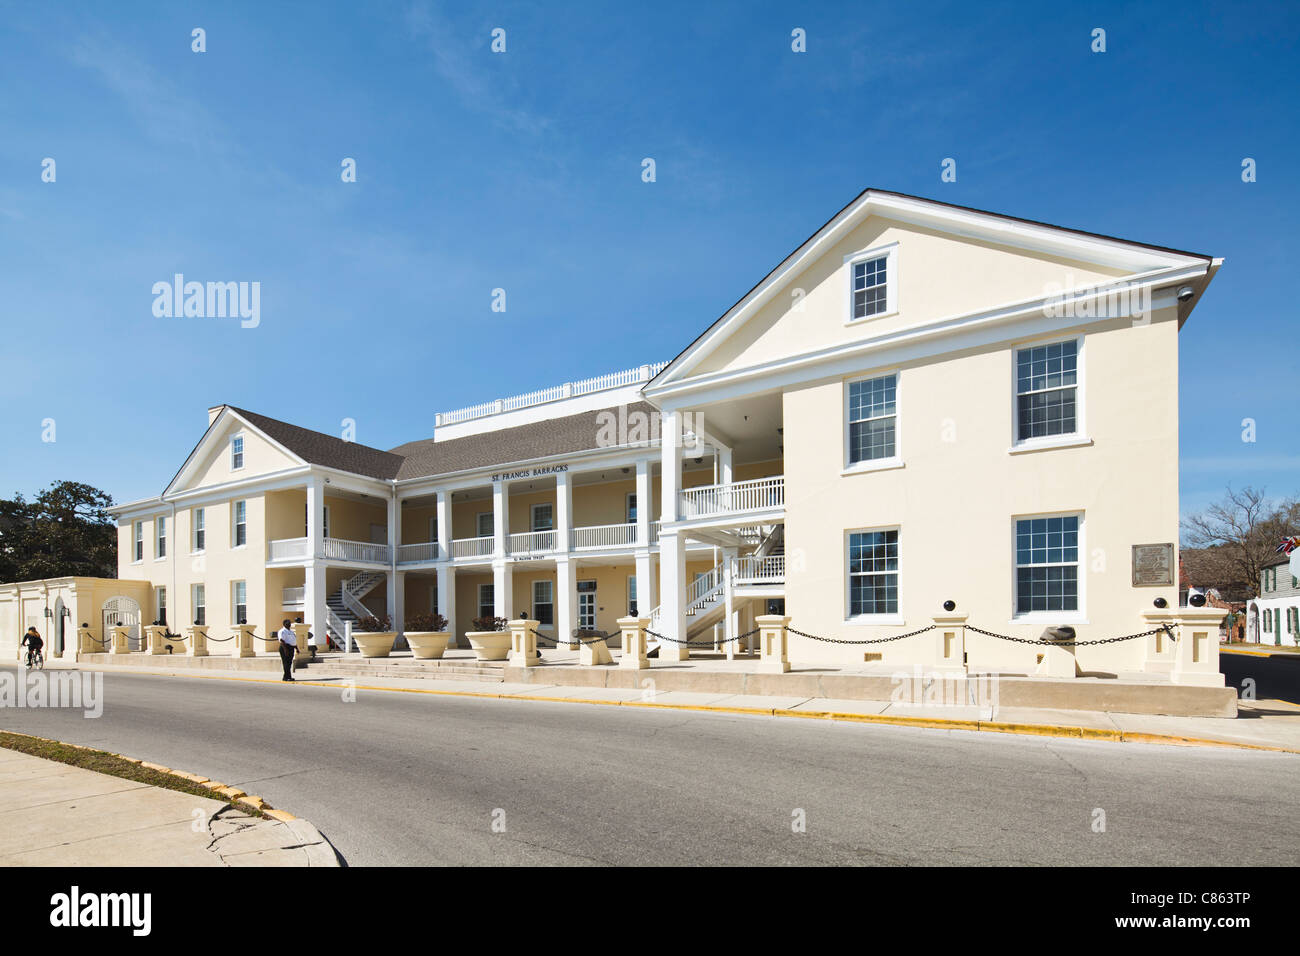 St Francis Barracks, St Augustine - Stock Image